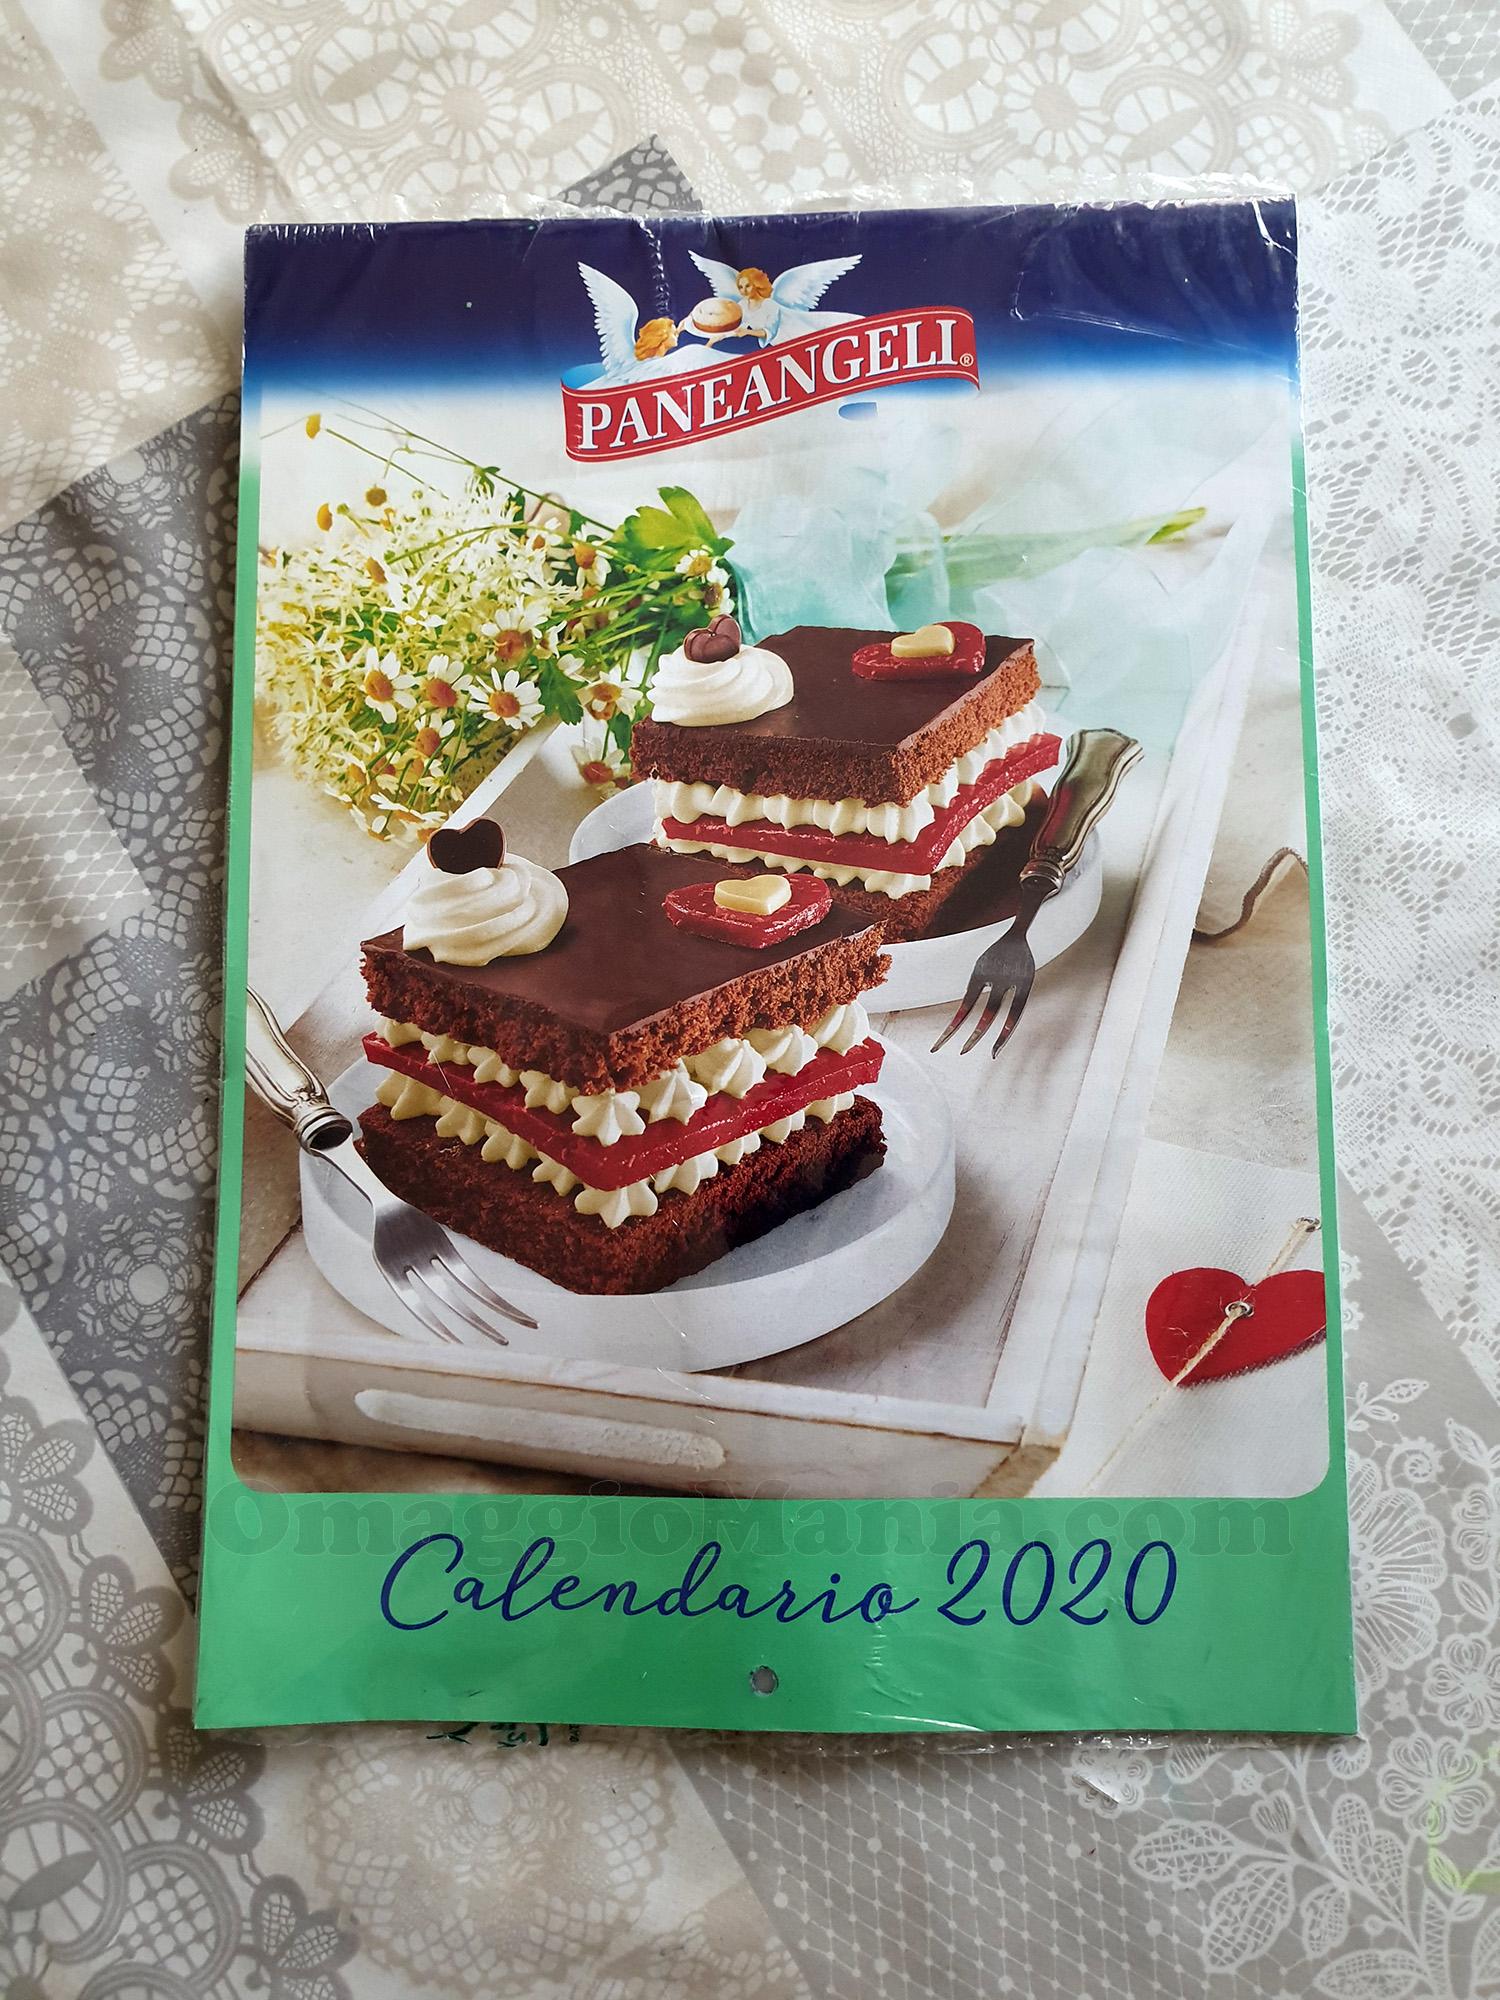 calendario Paneangeli 2020 di Claudia